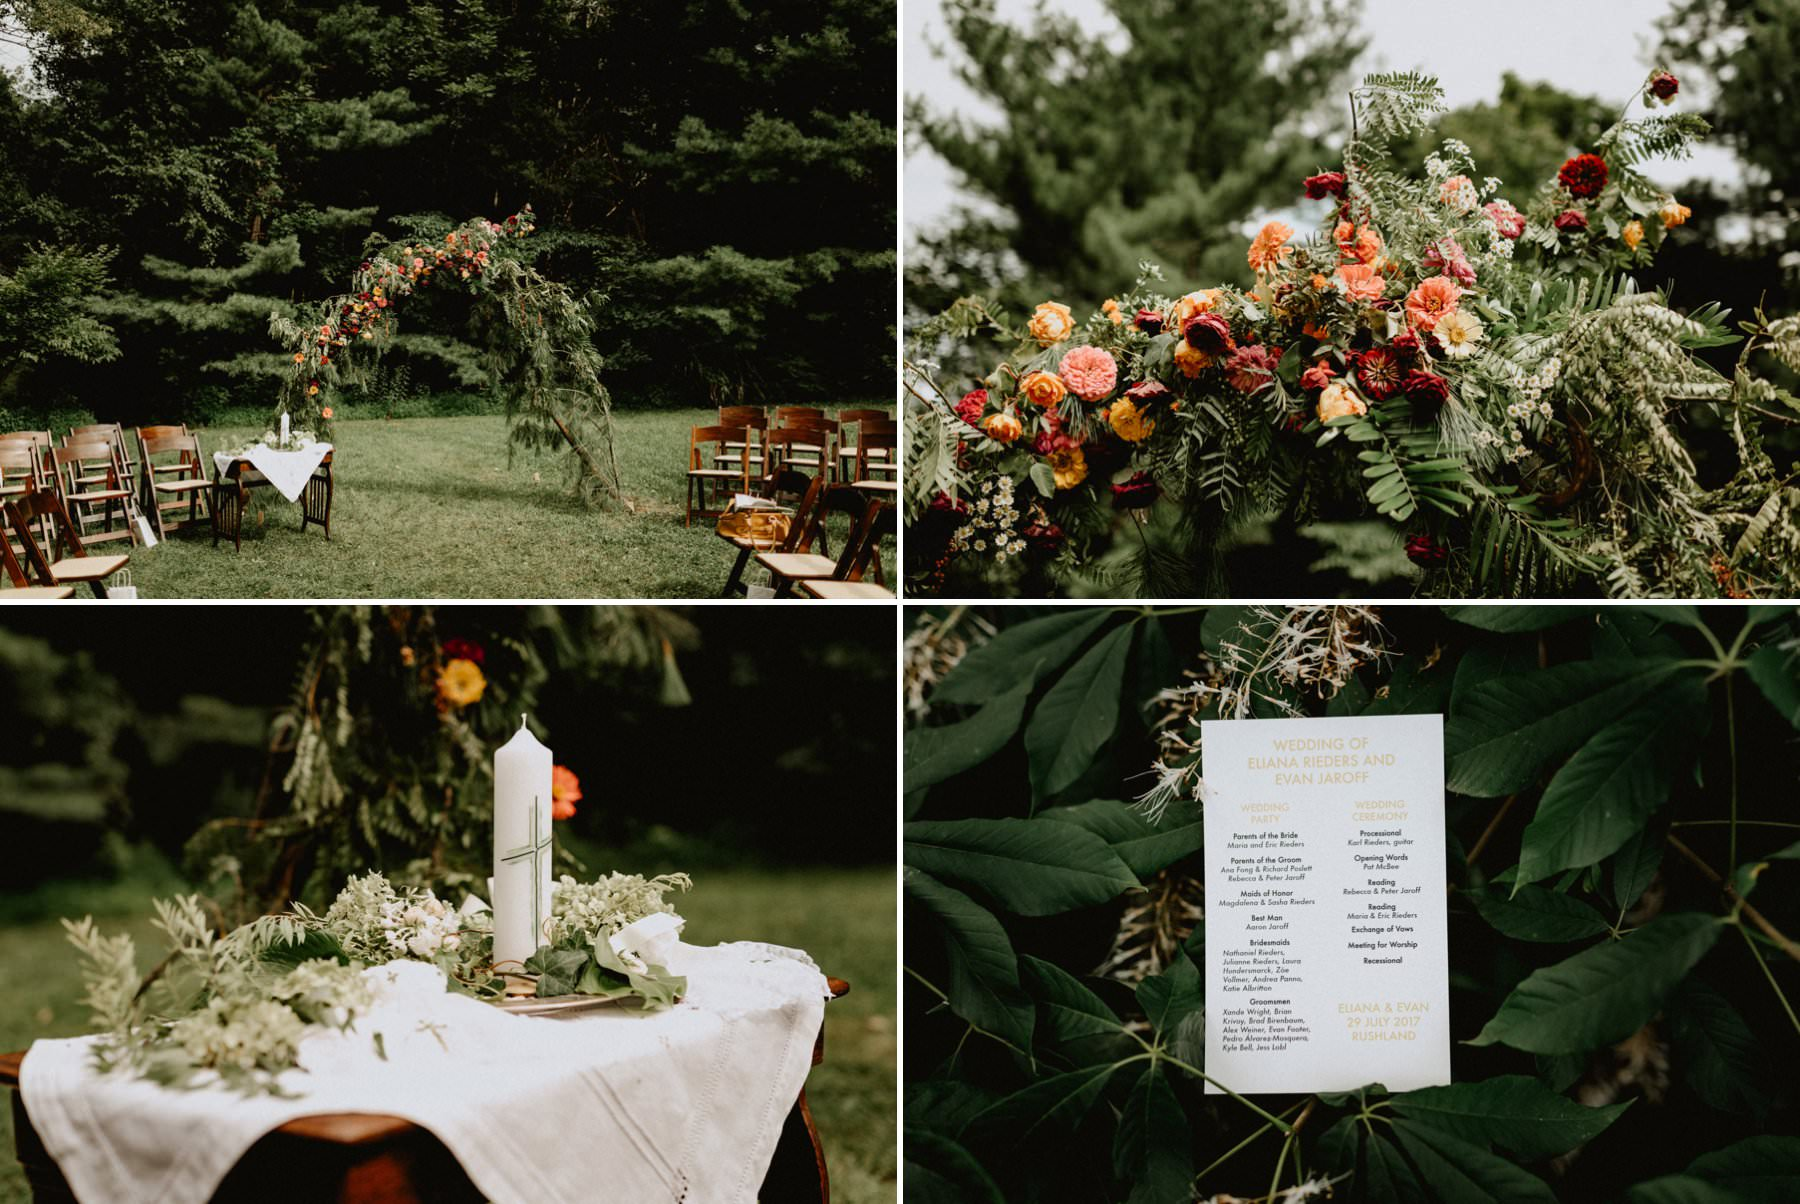 pennsylvania-private-estate-wedding-58.jpg